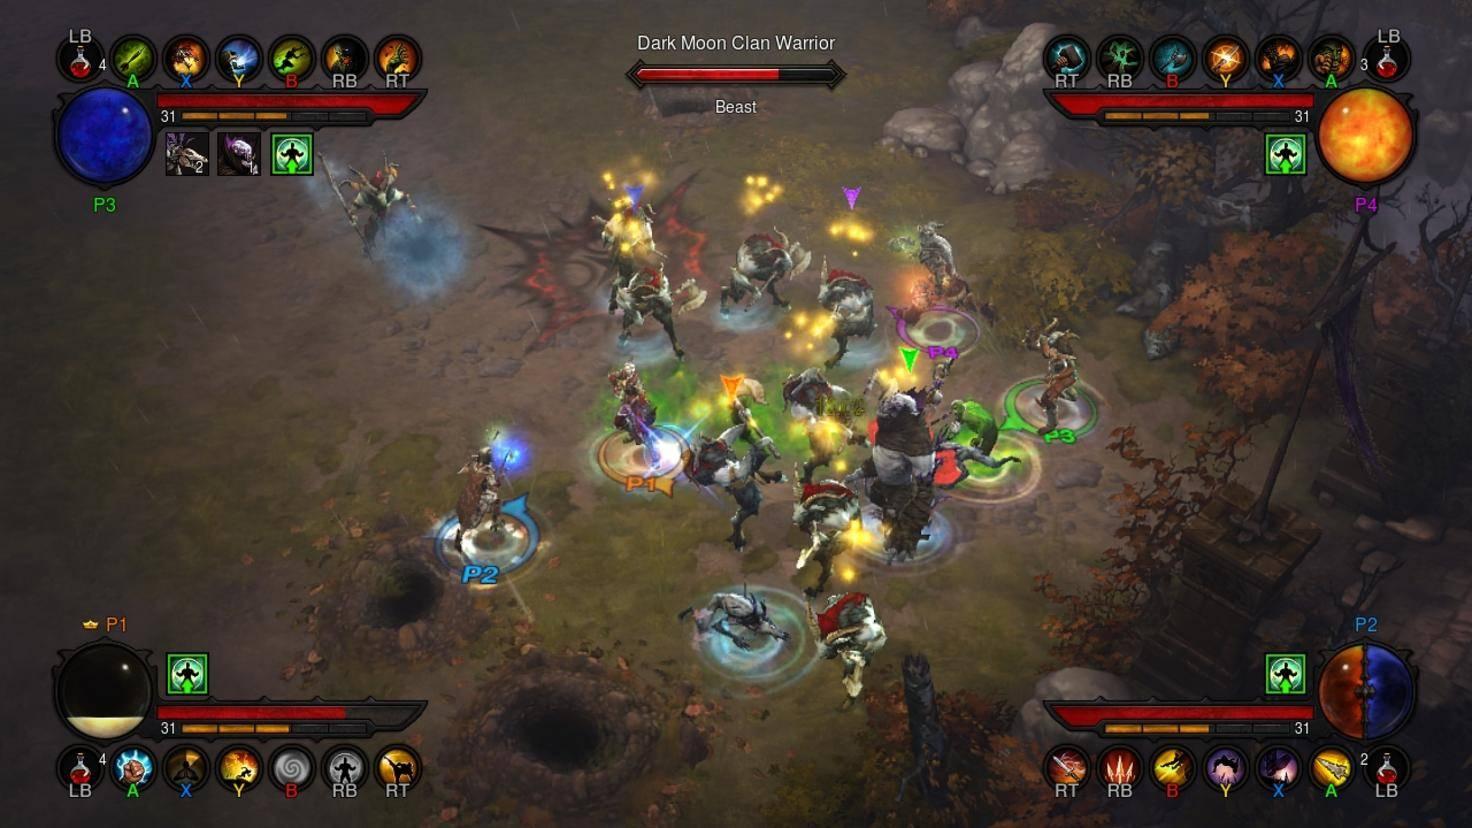 Diablo-3-Koop-Xbox-One-Four-Players